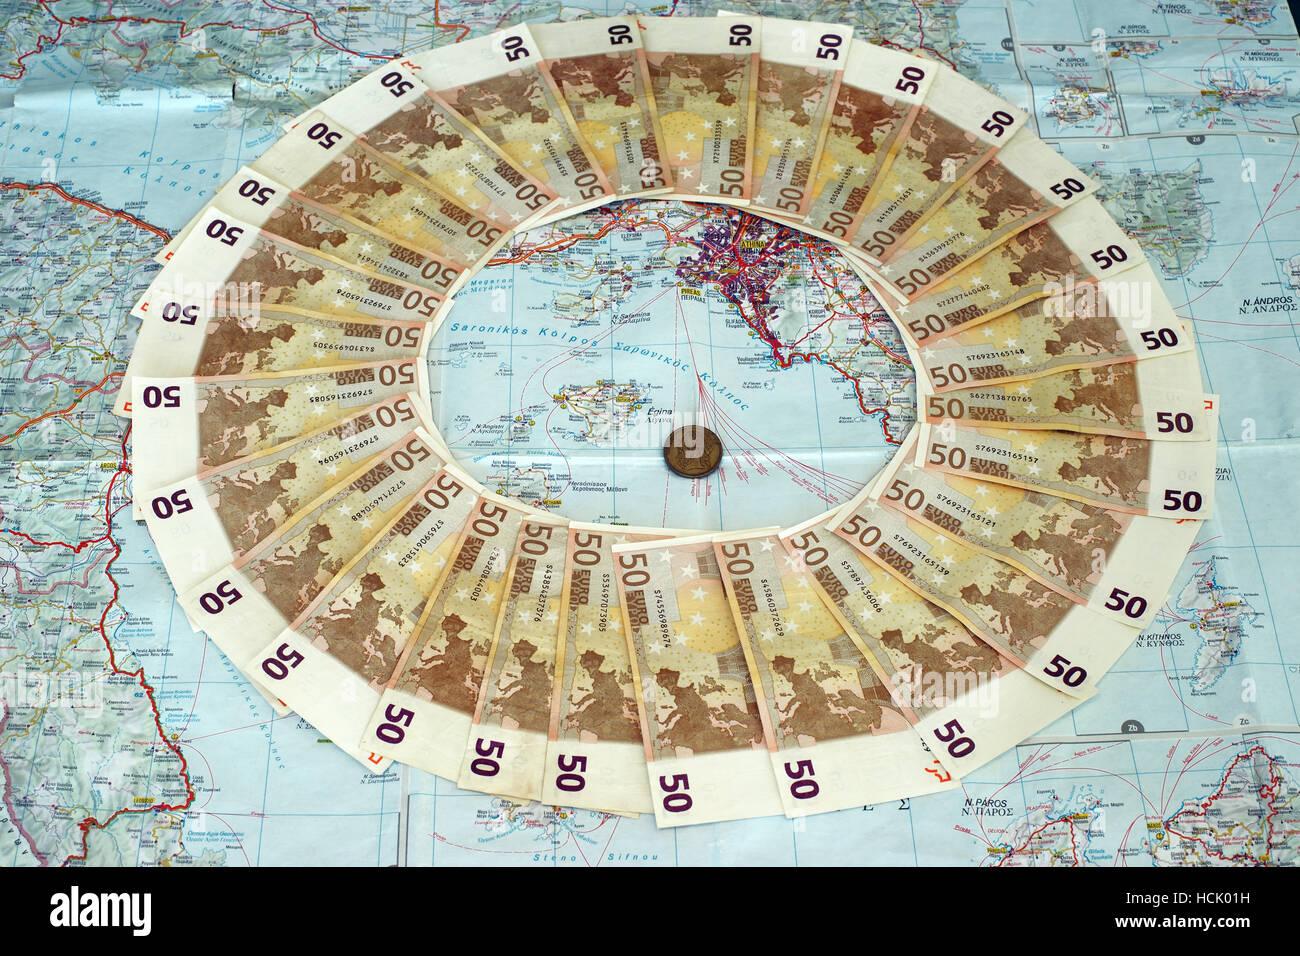 Billete de 50 euros en el mapa de Grecia con la dracma. Tappeto di banconote da 50 euros. Simbolizan la moratoria griega Foto de stock